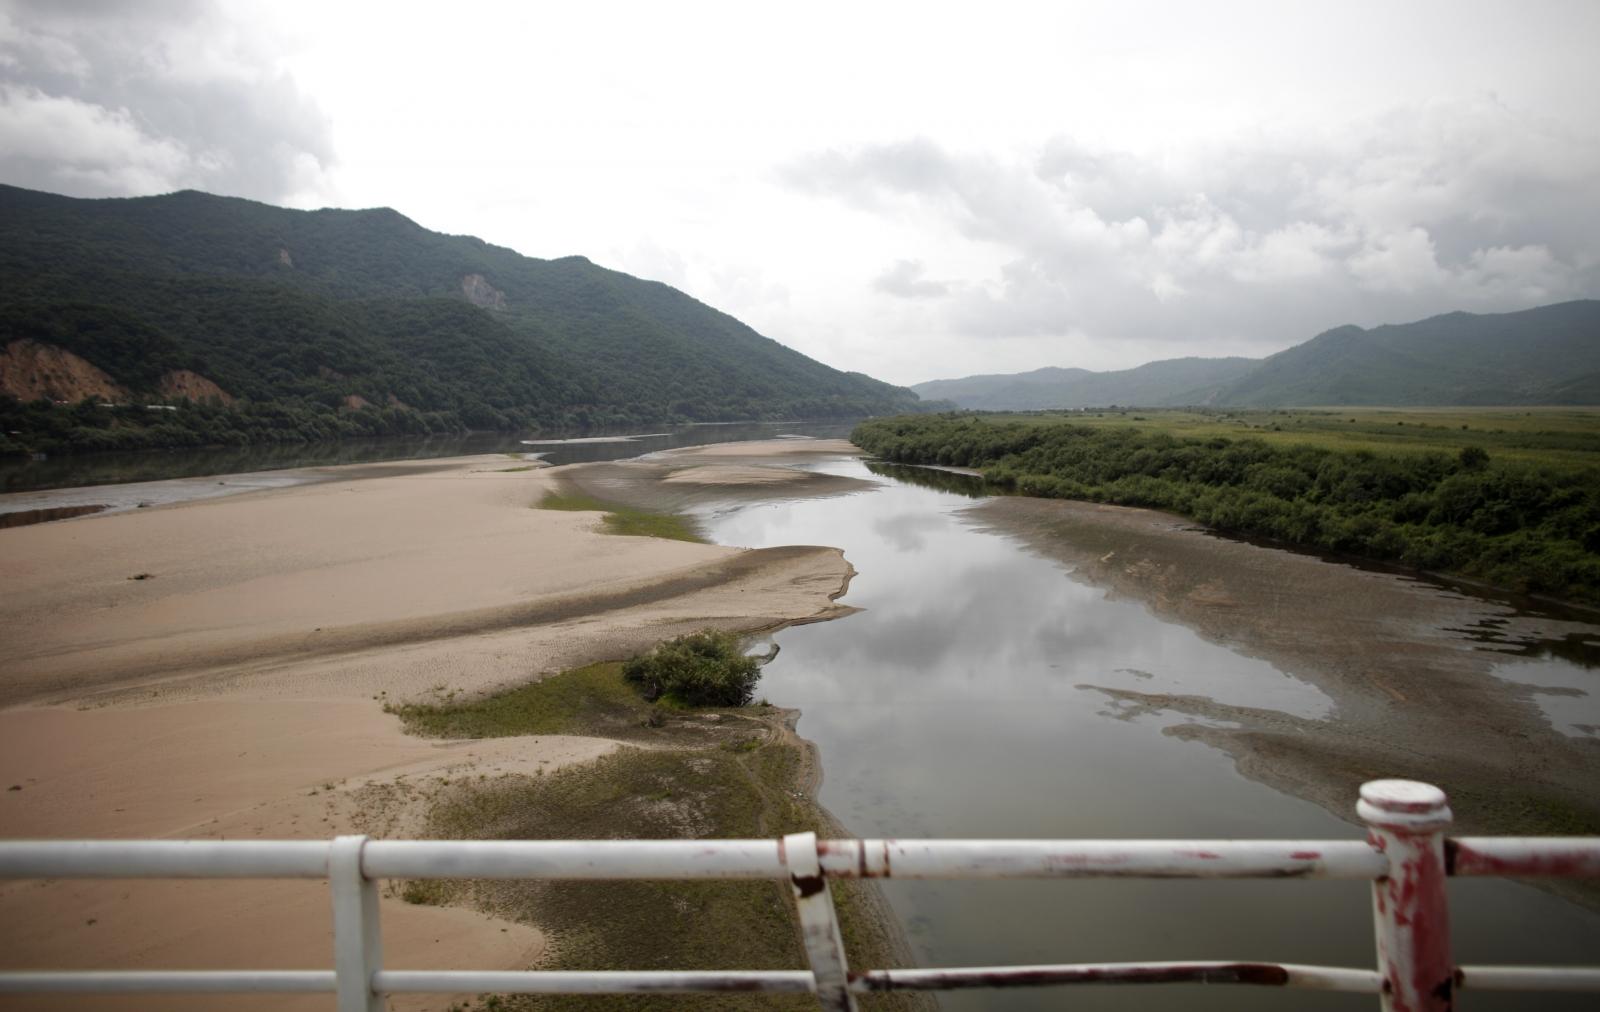 Tumen river